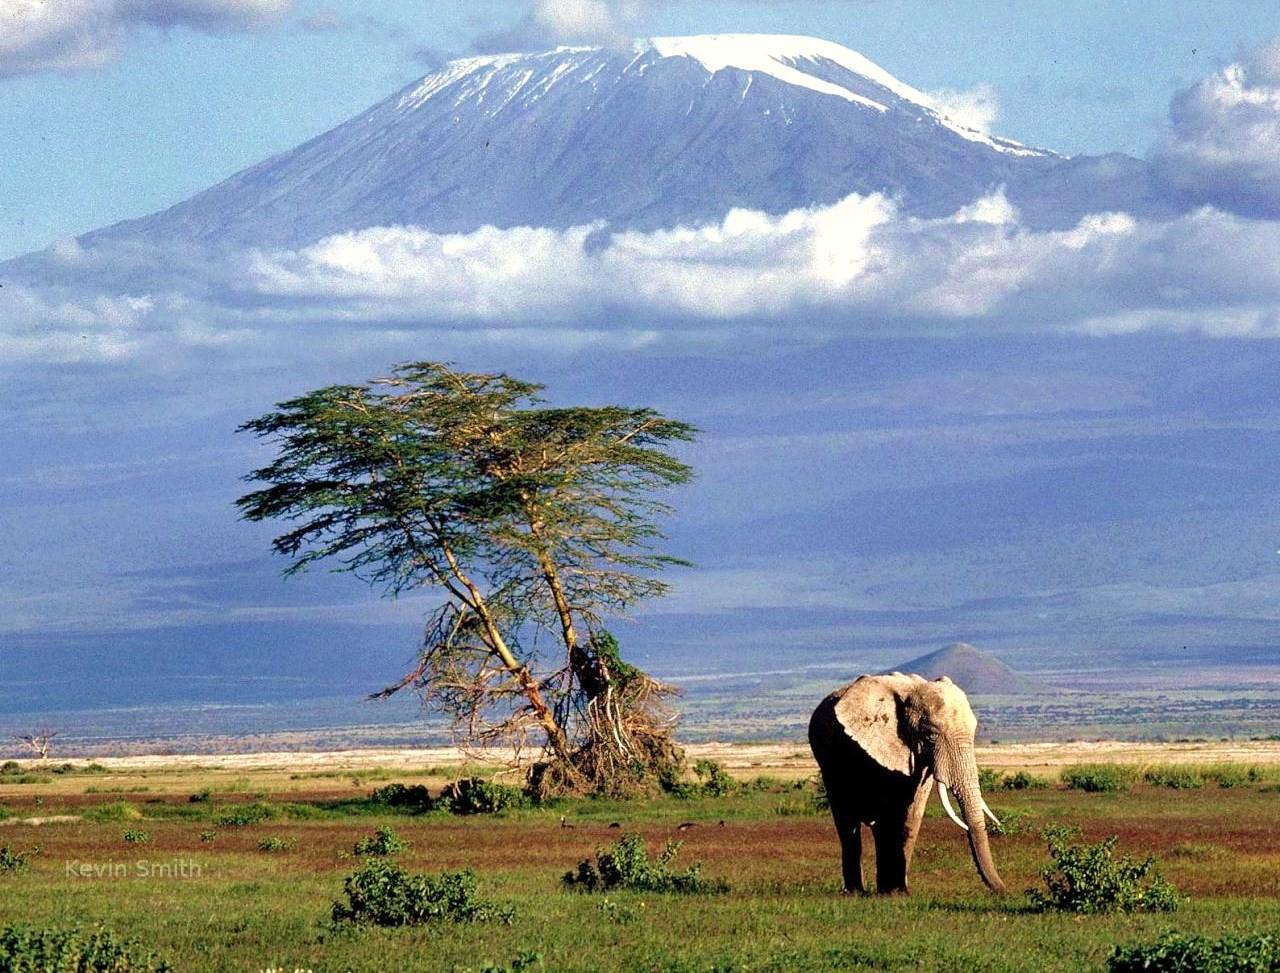 safari-in-africa-in-4x4-kruger-national-park